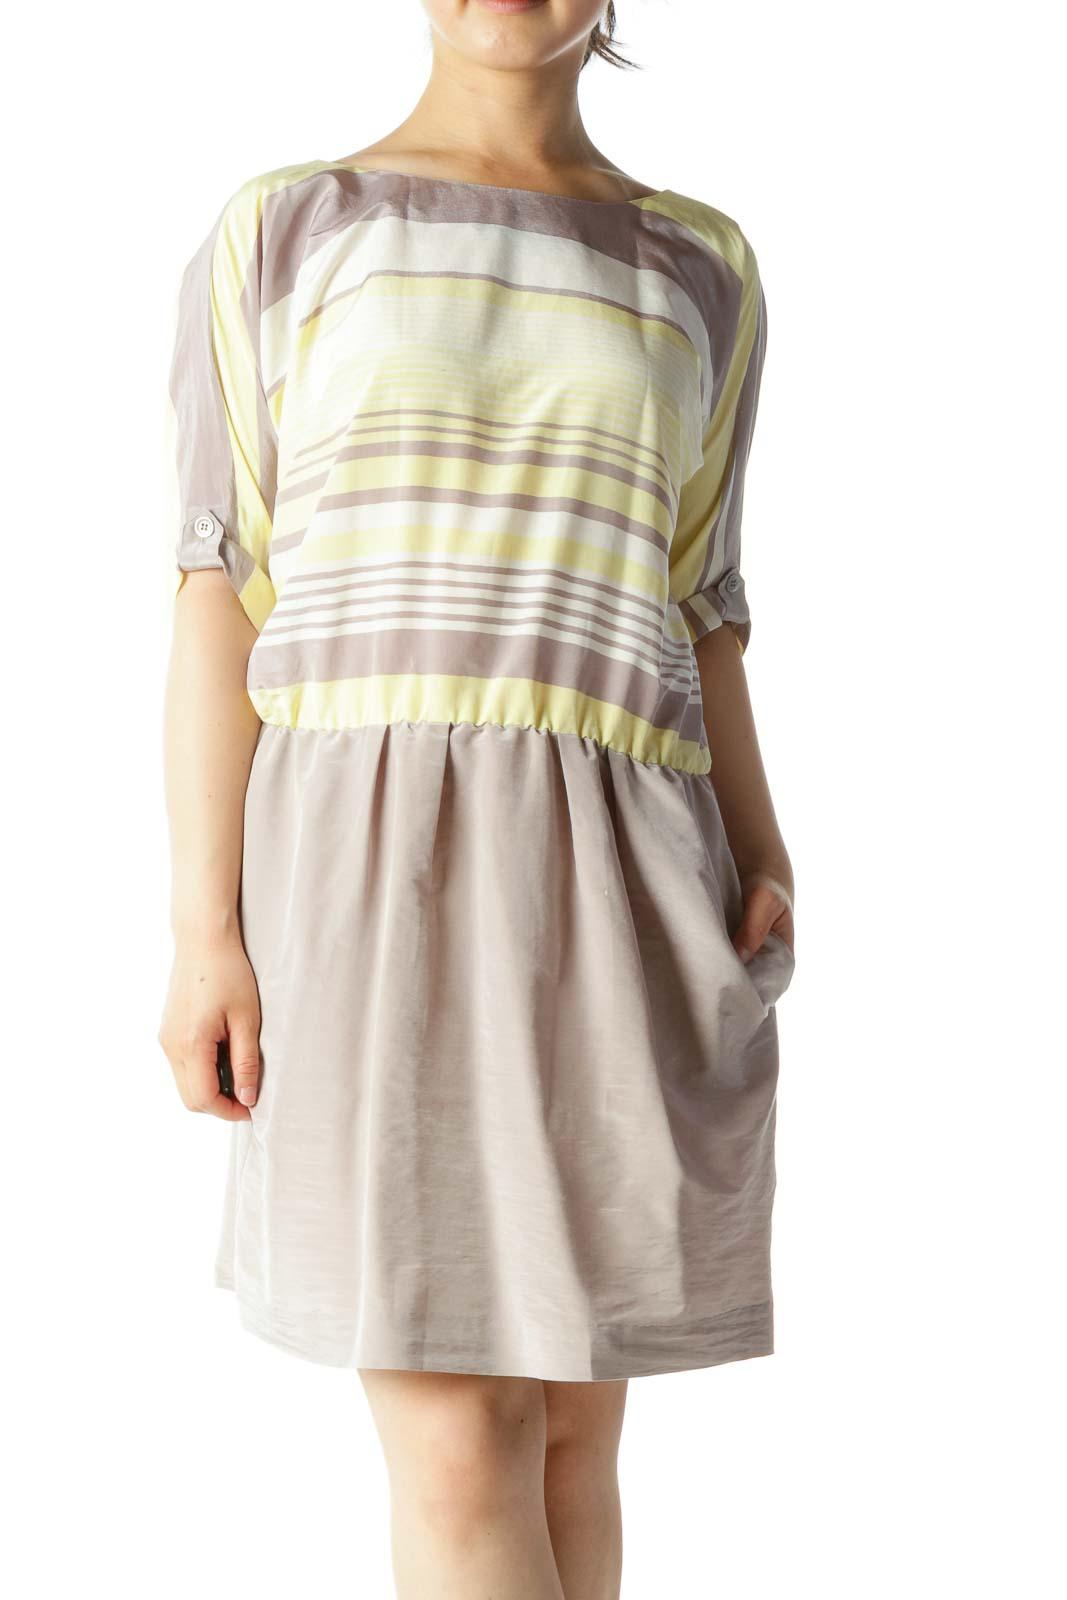 Beige Yellow White Gradient Stripes Bat Sleeves Elastic Waist Dress Front